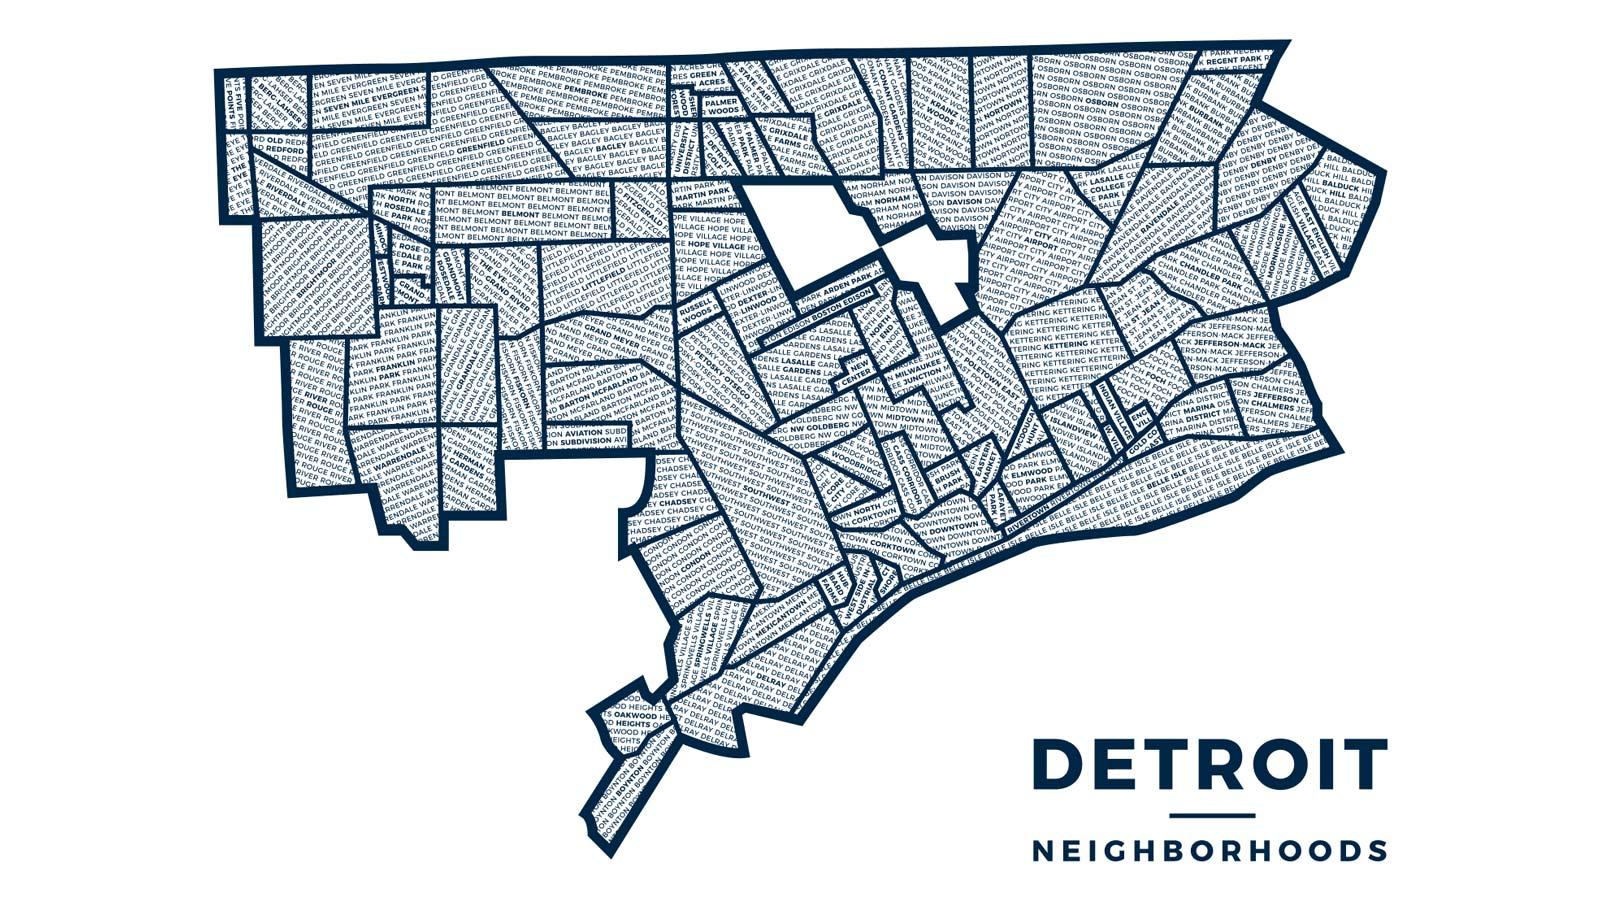 My newly designed Detroit neighborhoods map.